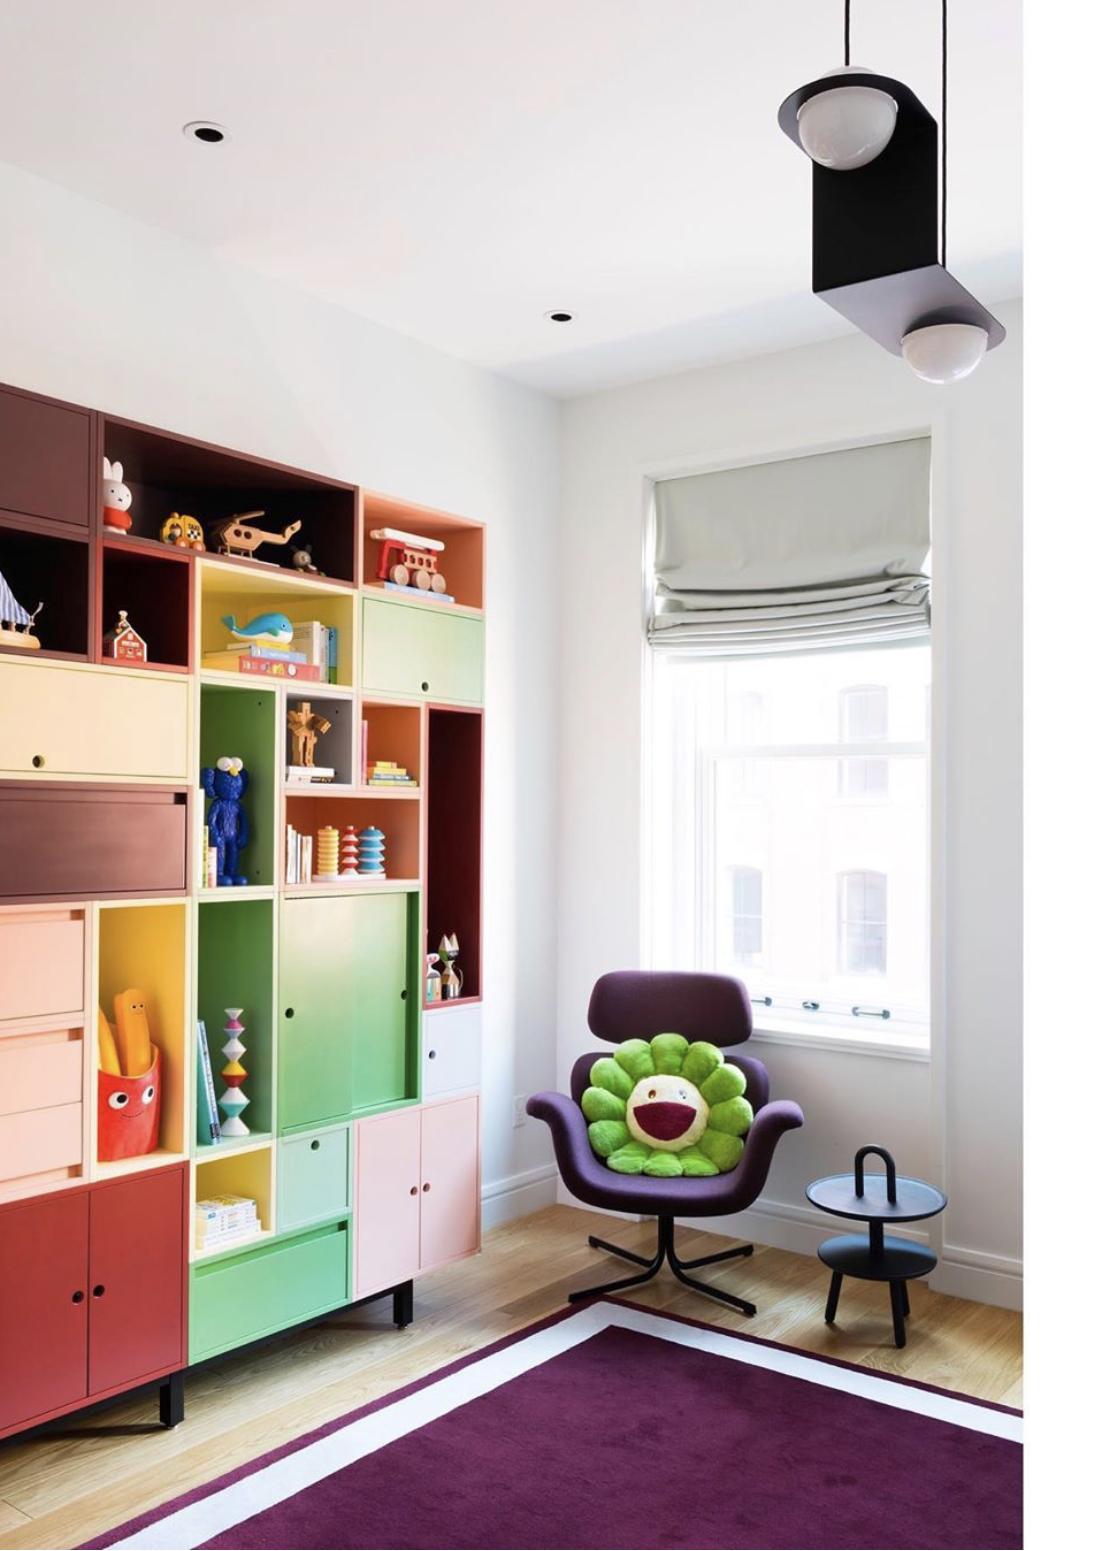 Home Interior Design Game Online: Pin By Megan Troka On Interiors- Nursery & Kids Bedrooms